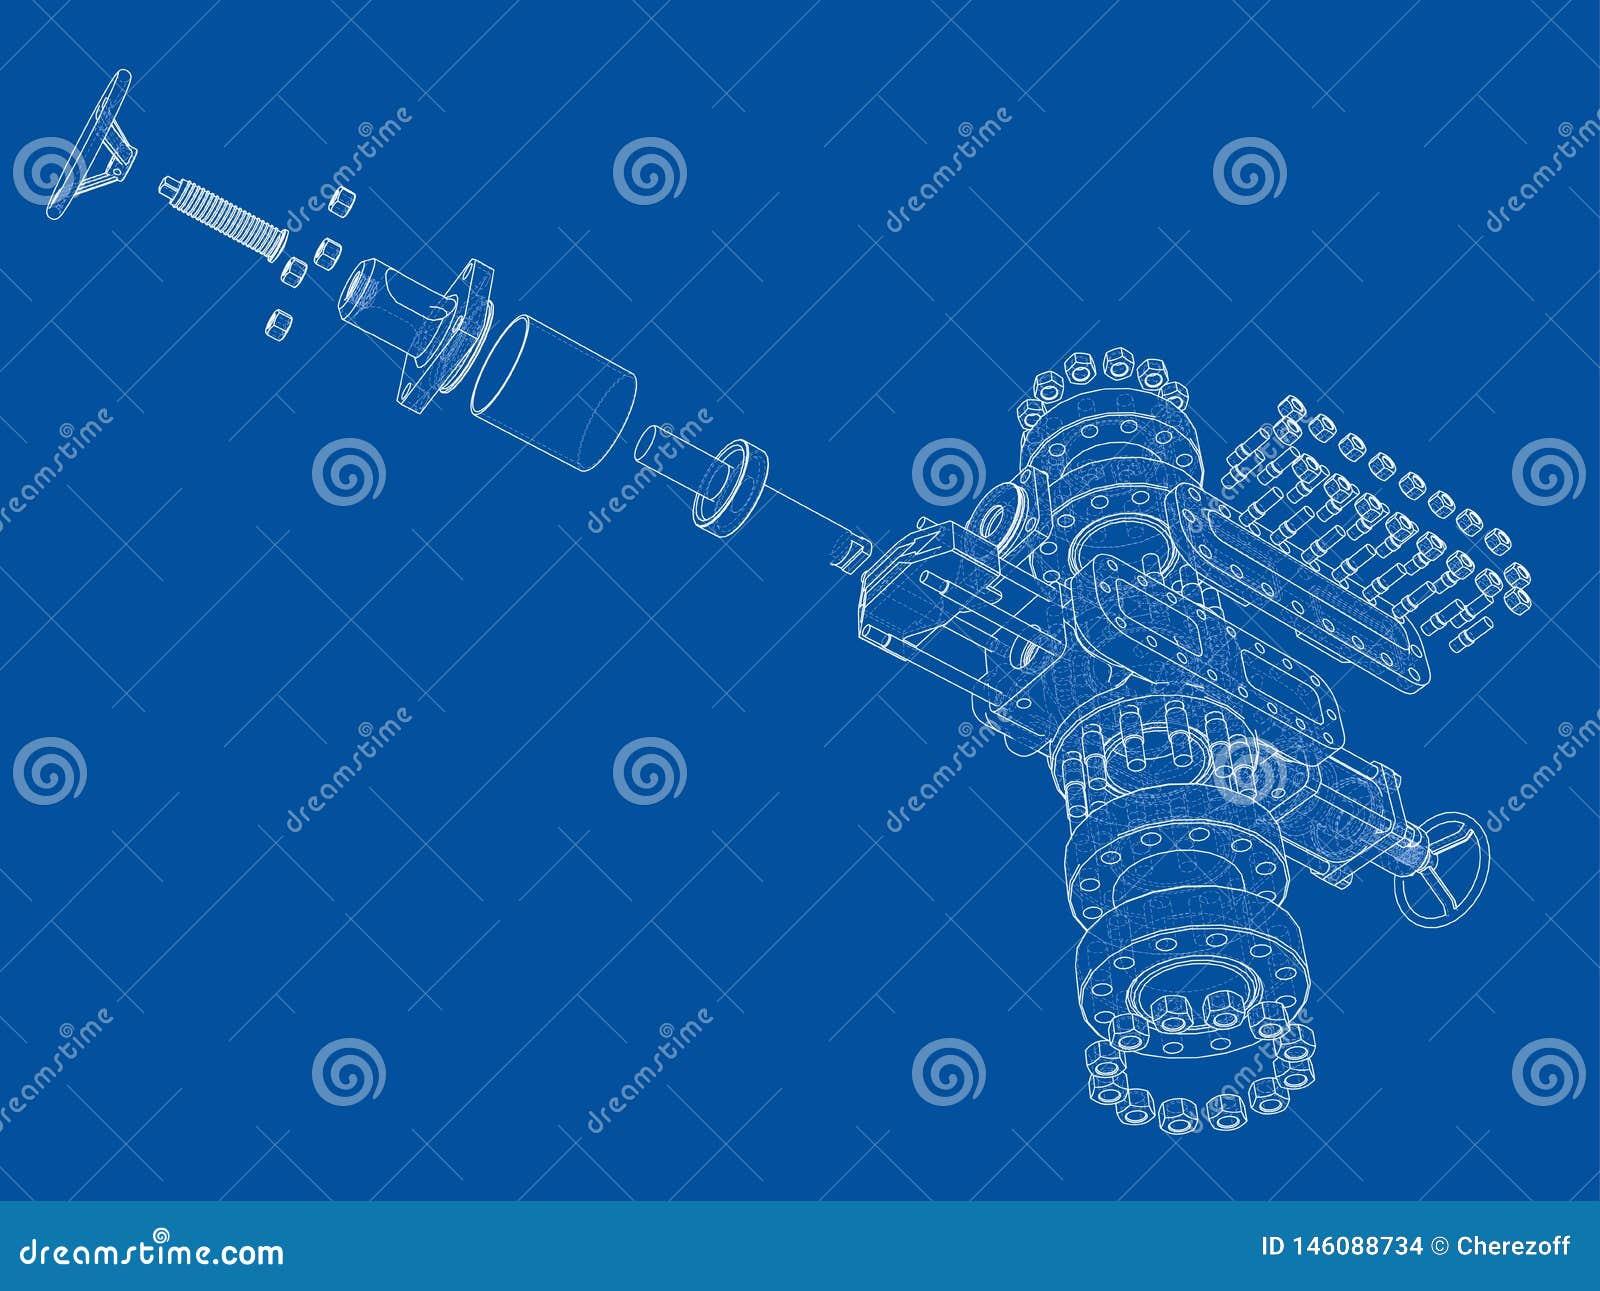 Blowout preventer. Vector rendering of 3d